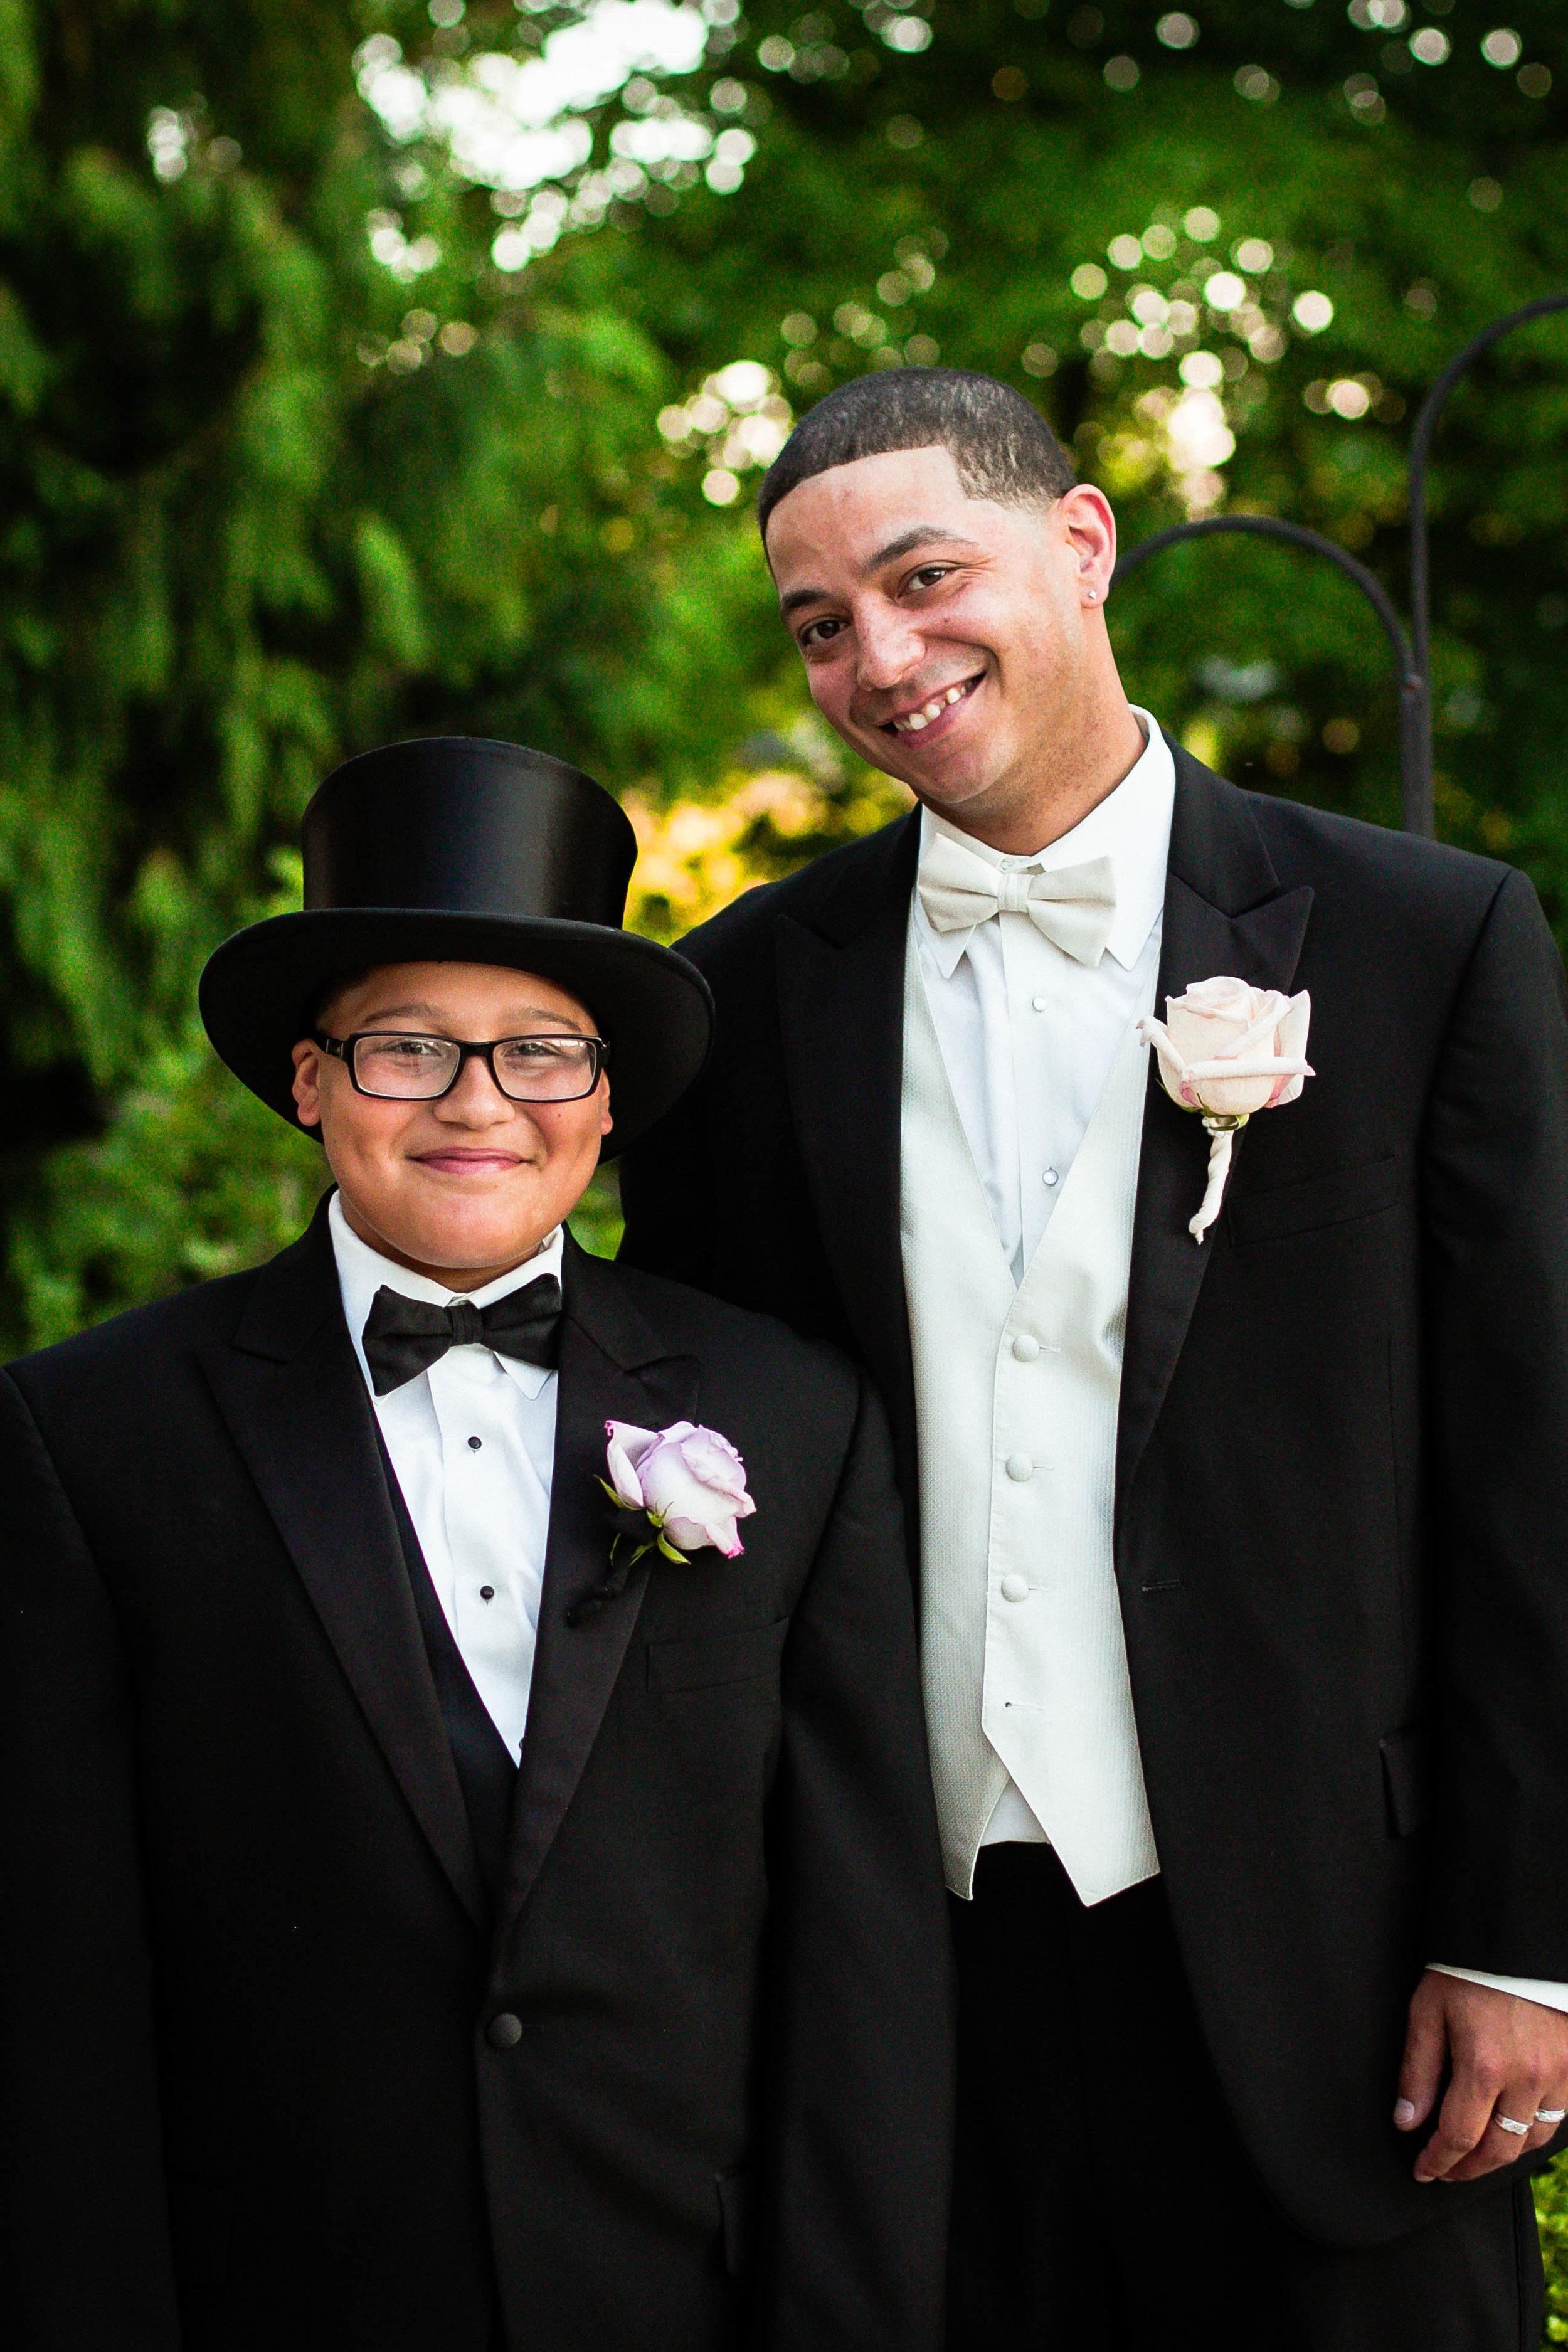 WeddingPortfolio-25.jpg